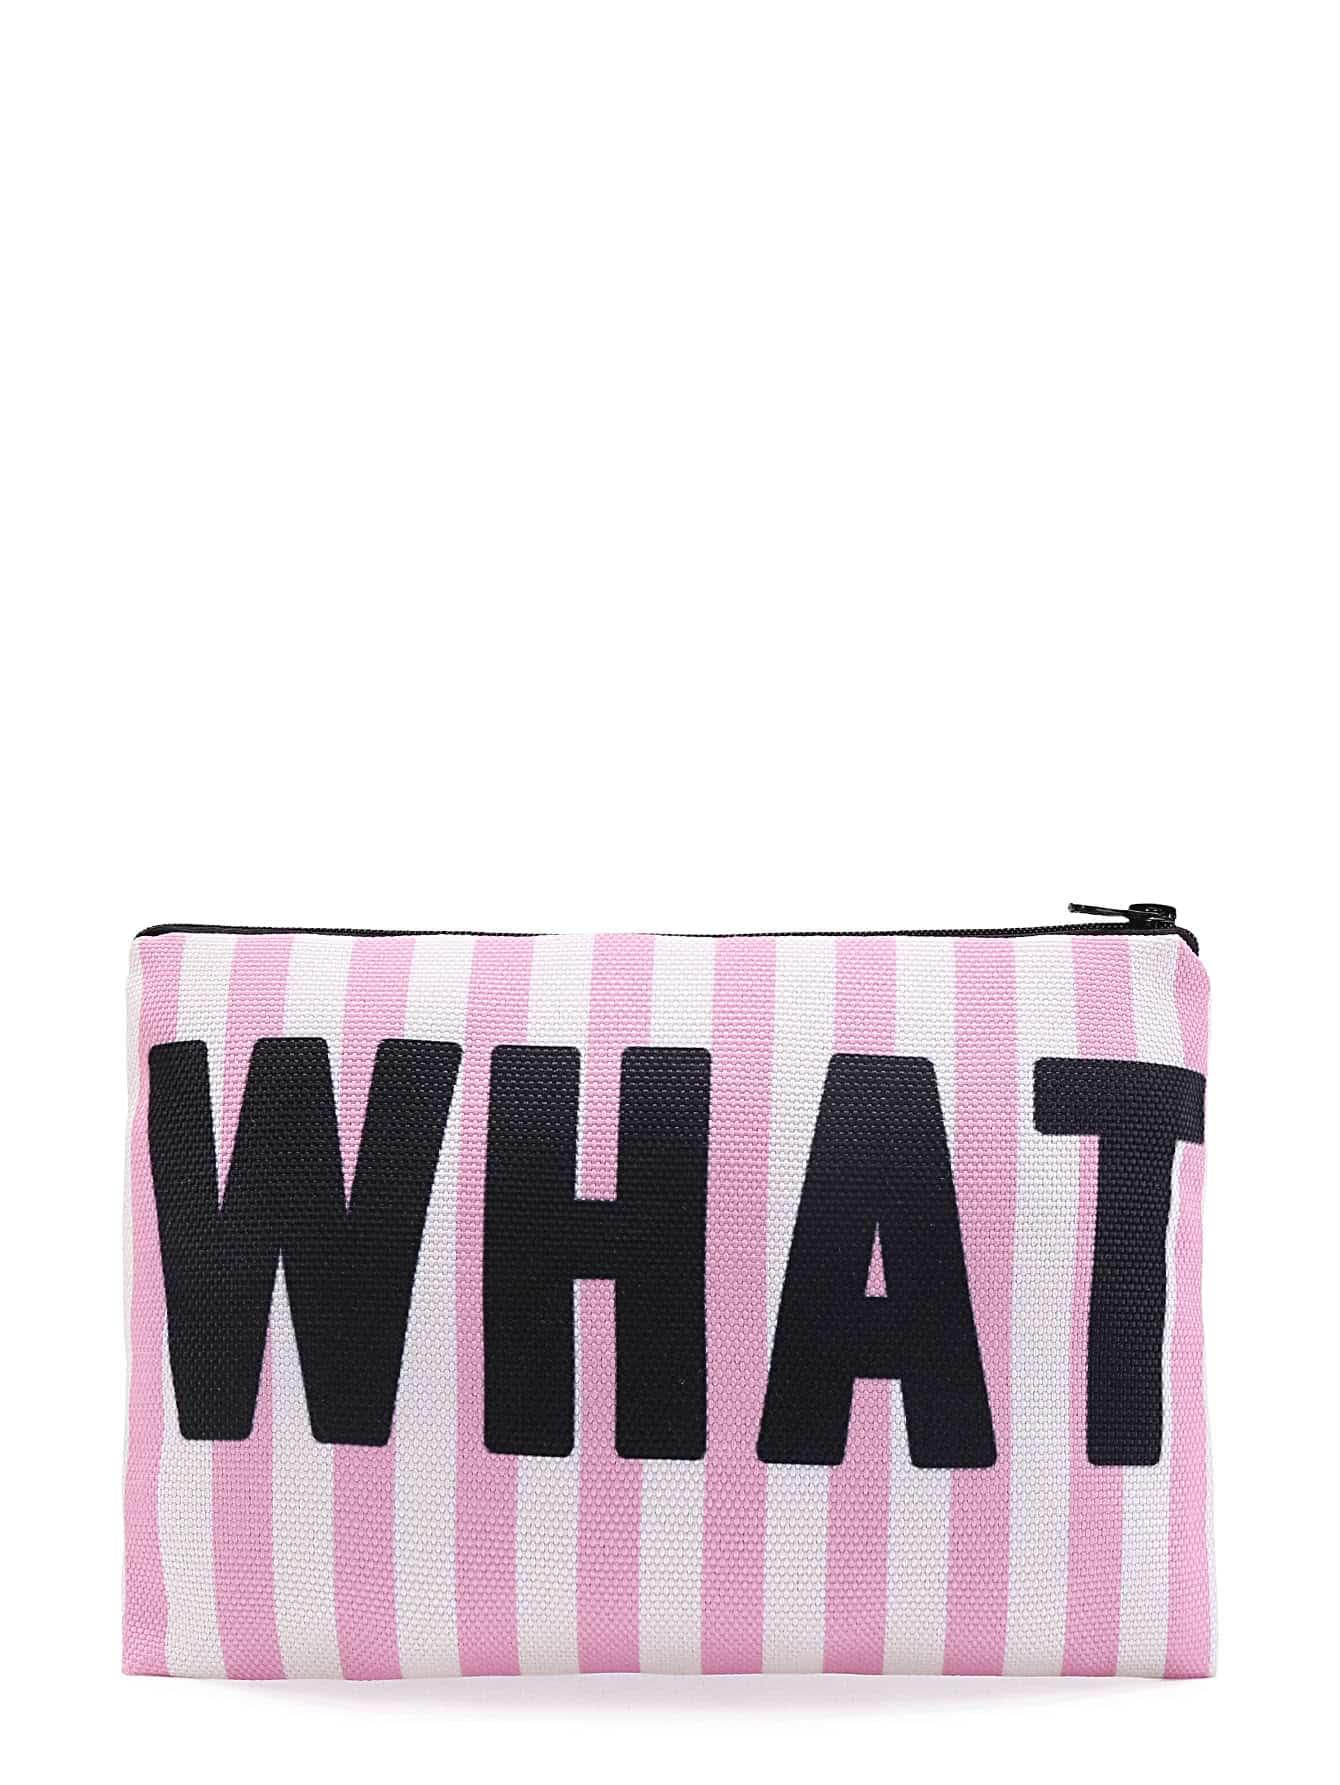 Slogan & Striped Print Zipper Cosmetic Bag